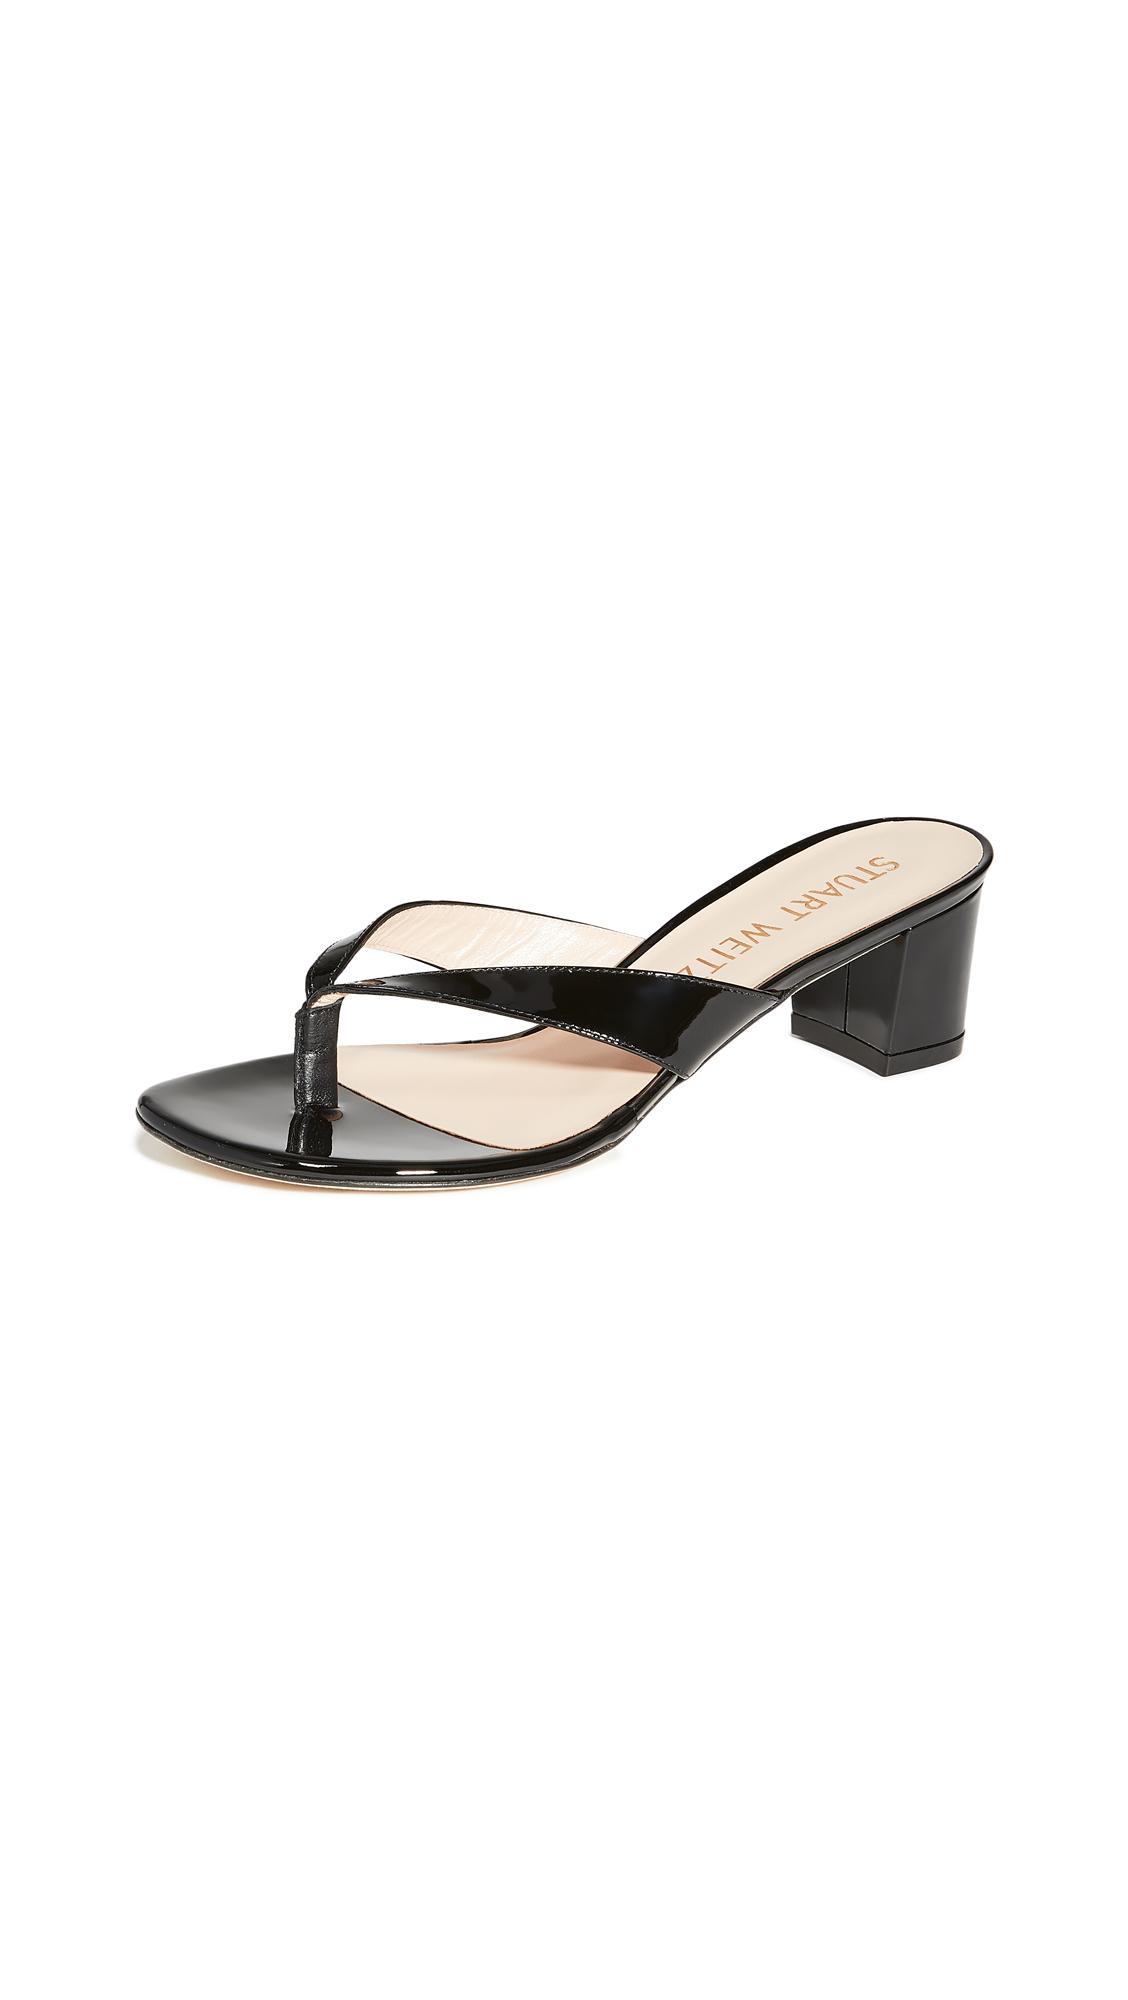 Stuart Weitzman Brigida 50mm Sandals - Black